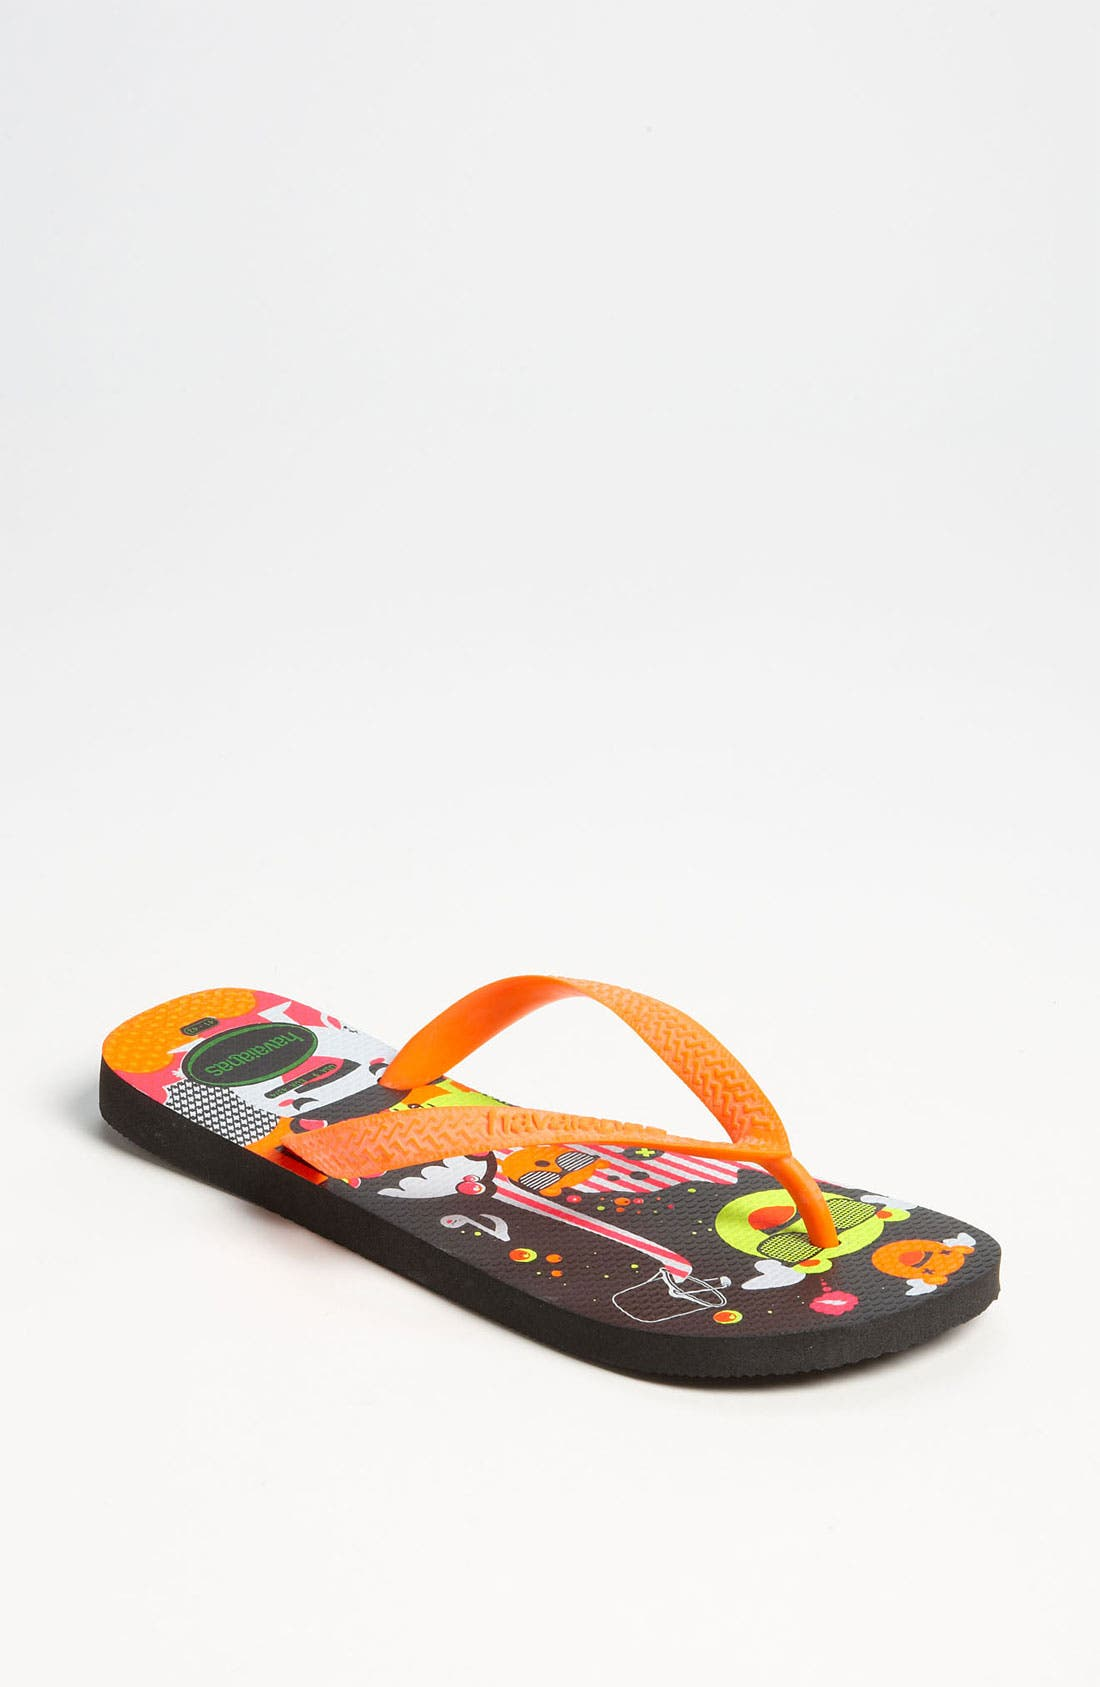 Main Image - Havaianas 'Fun' Flip Flop (Women)